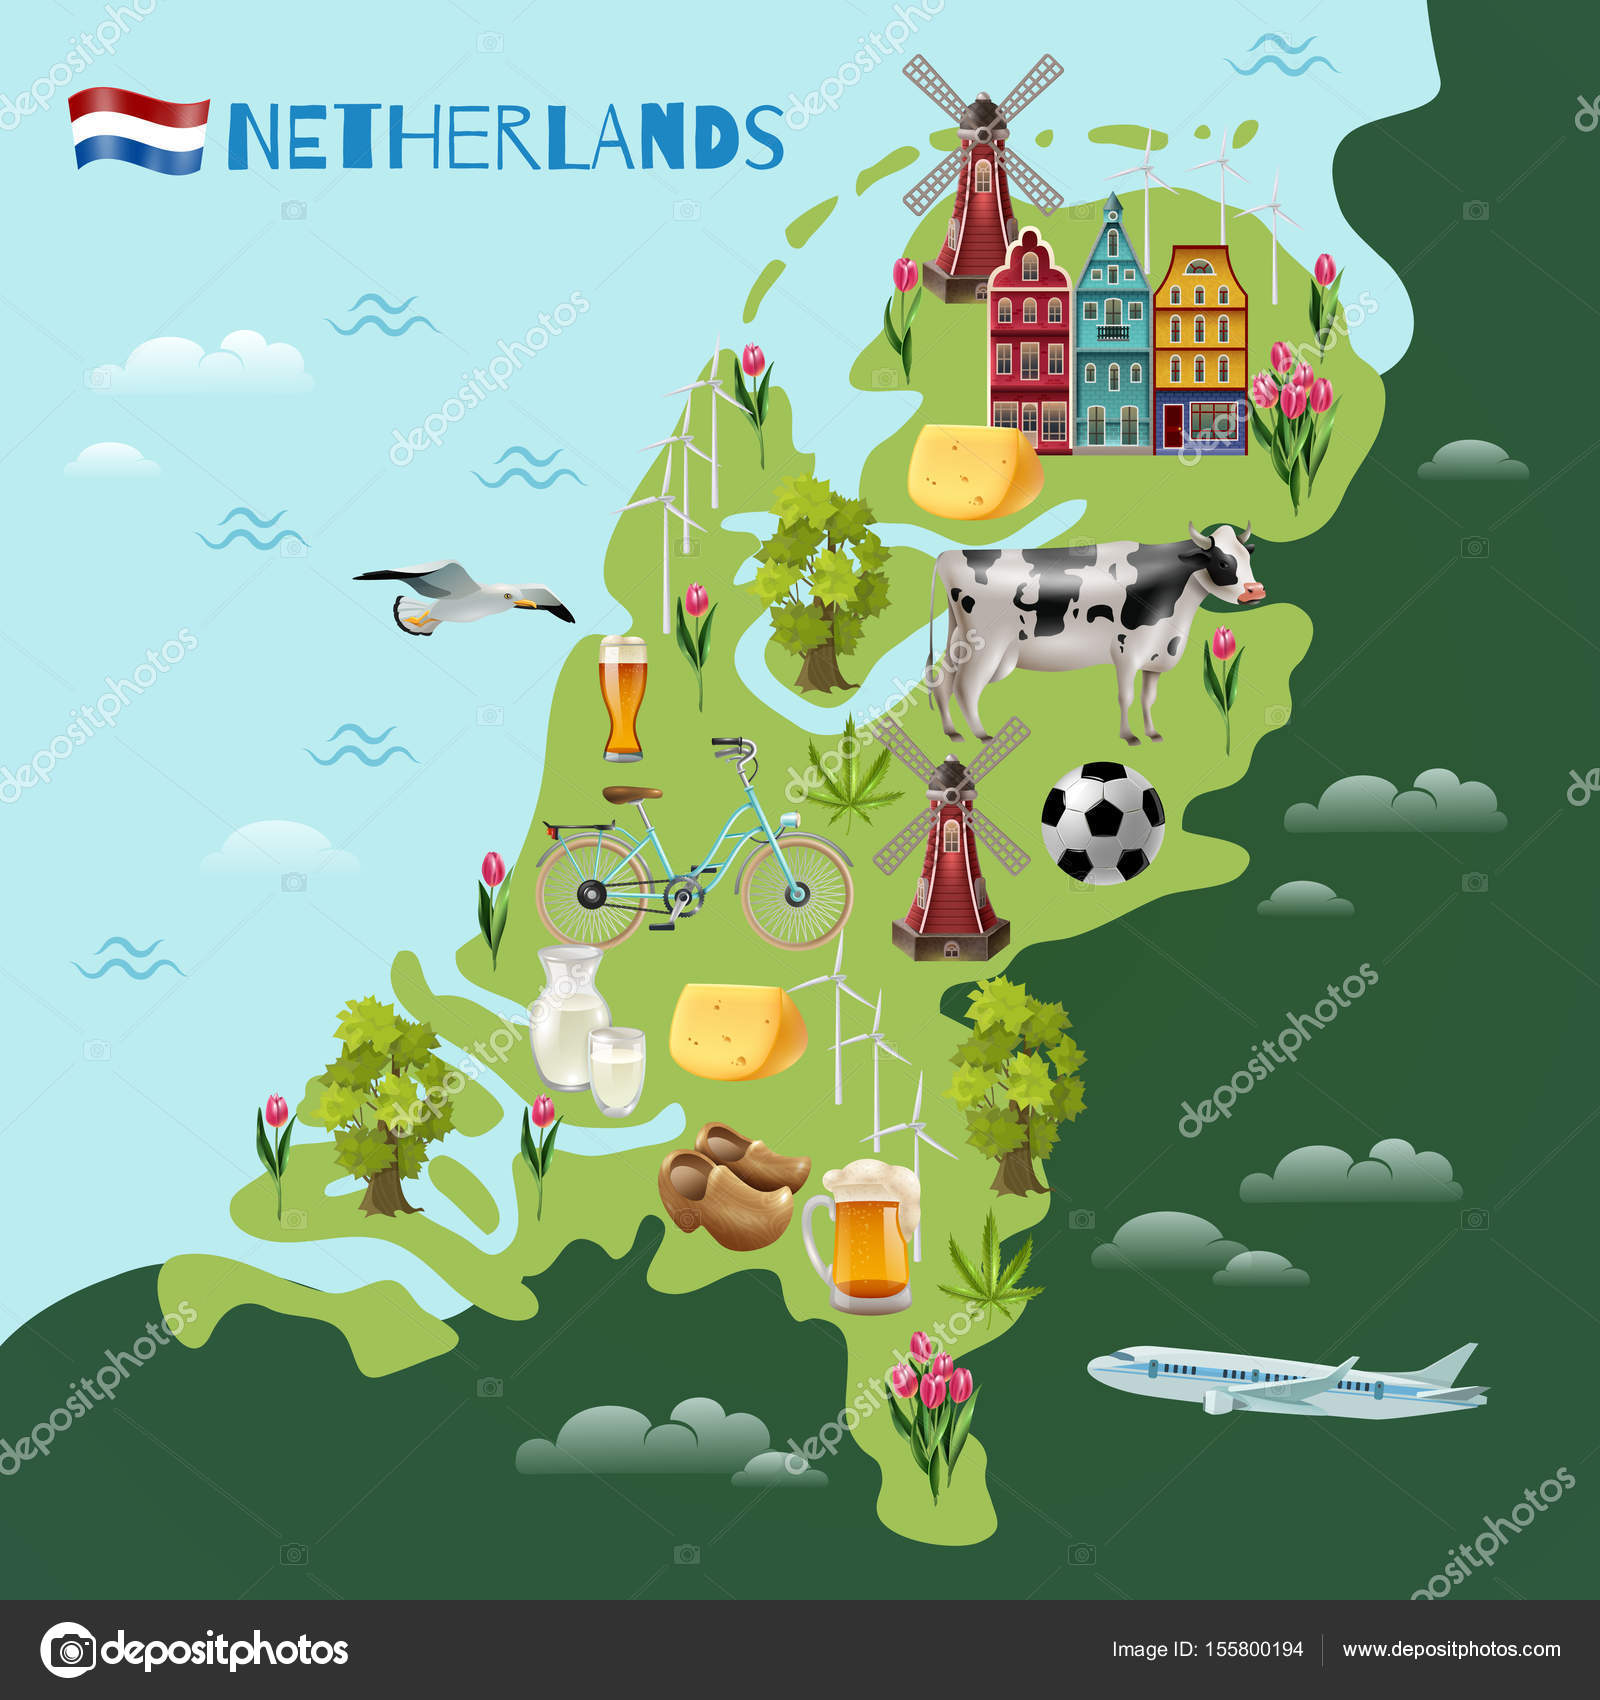 holanda mapa turistico Holanda viajes culturales mapa Poster — Vector de stock  holanda mapa turistico